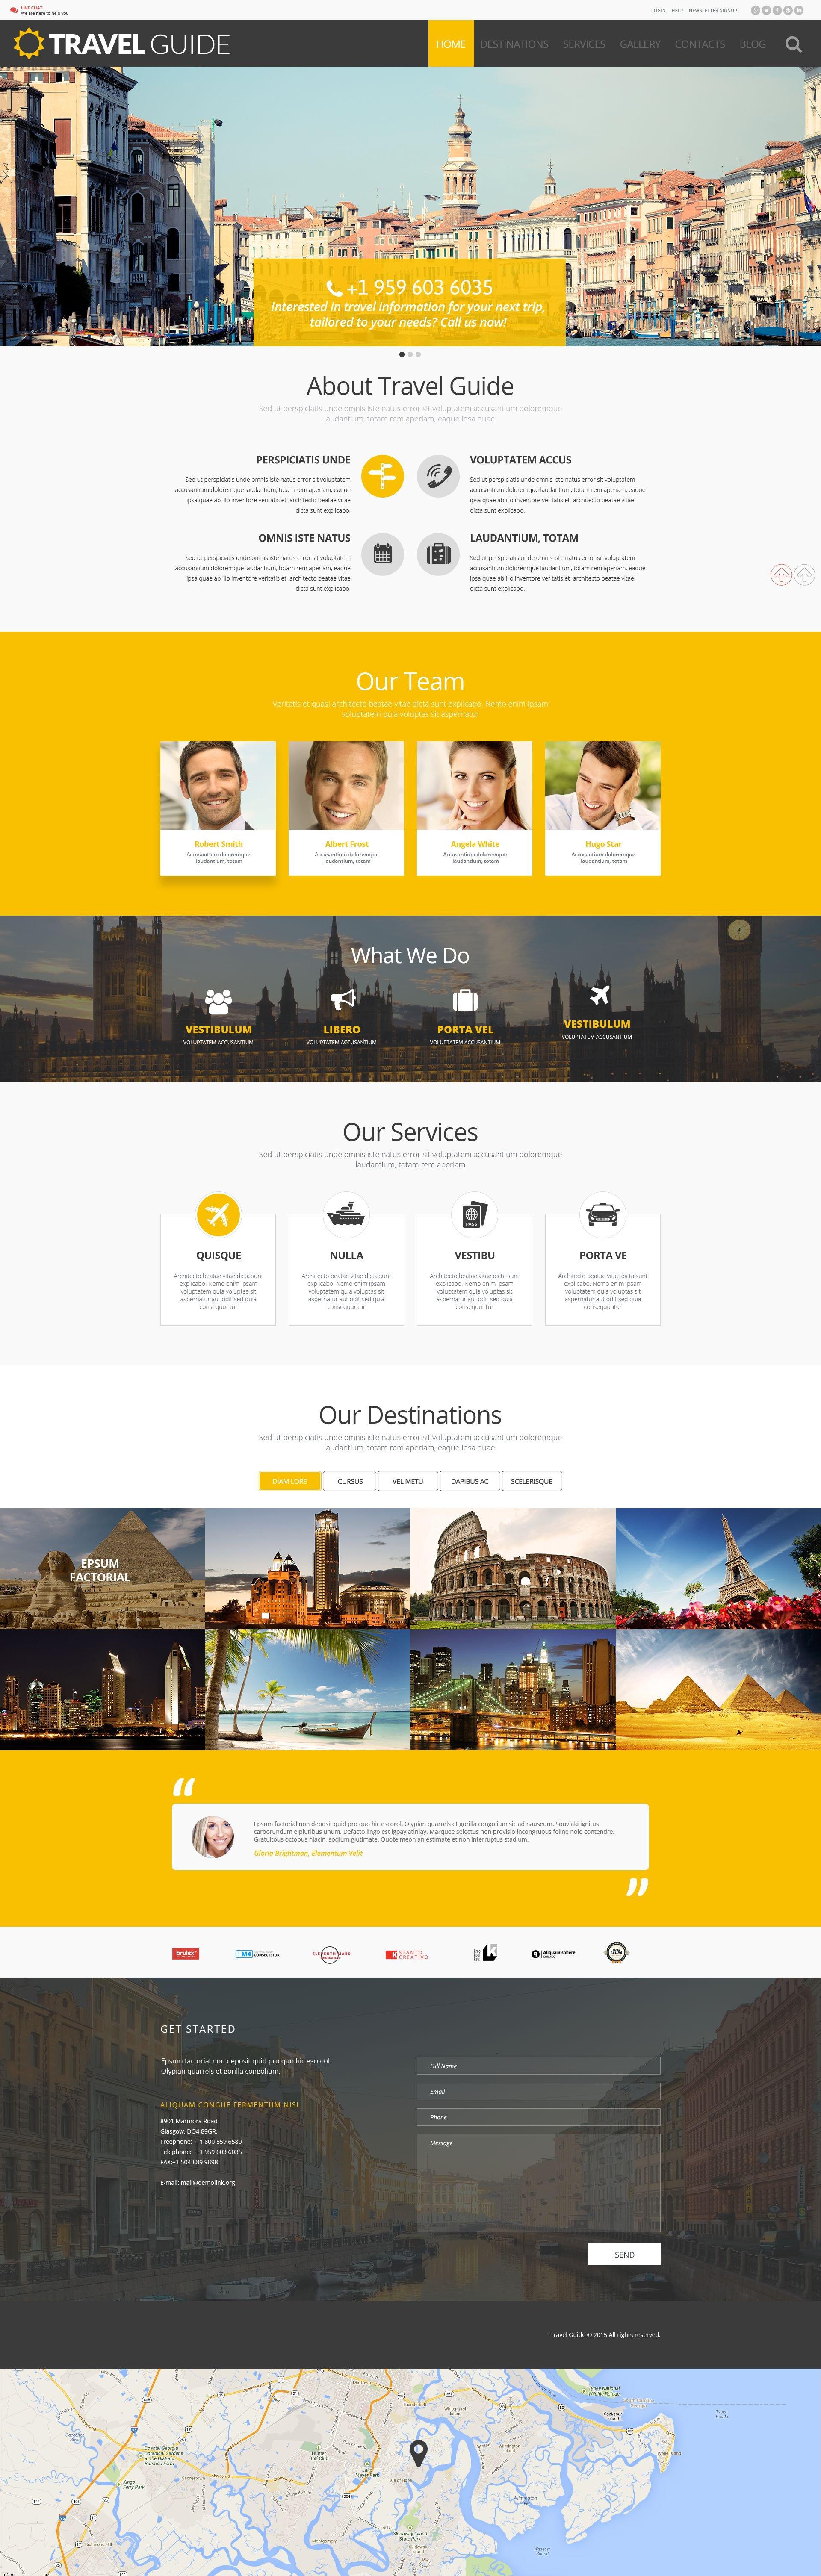 """Travel Guide"" - адаптивний WordPress шаблон №54988"